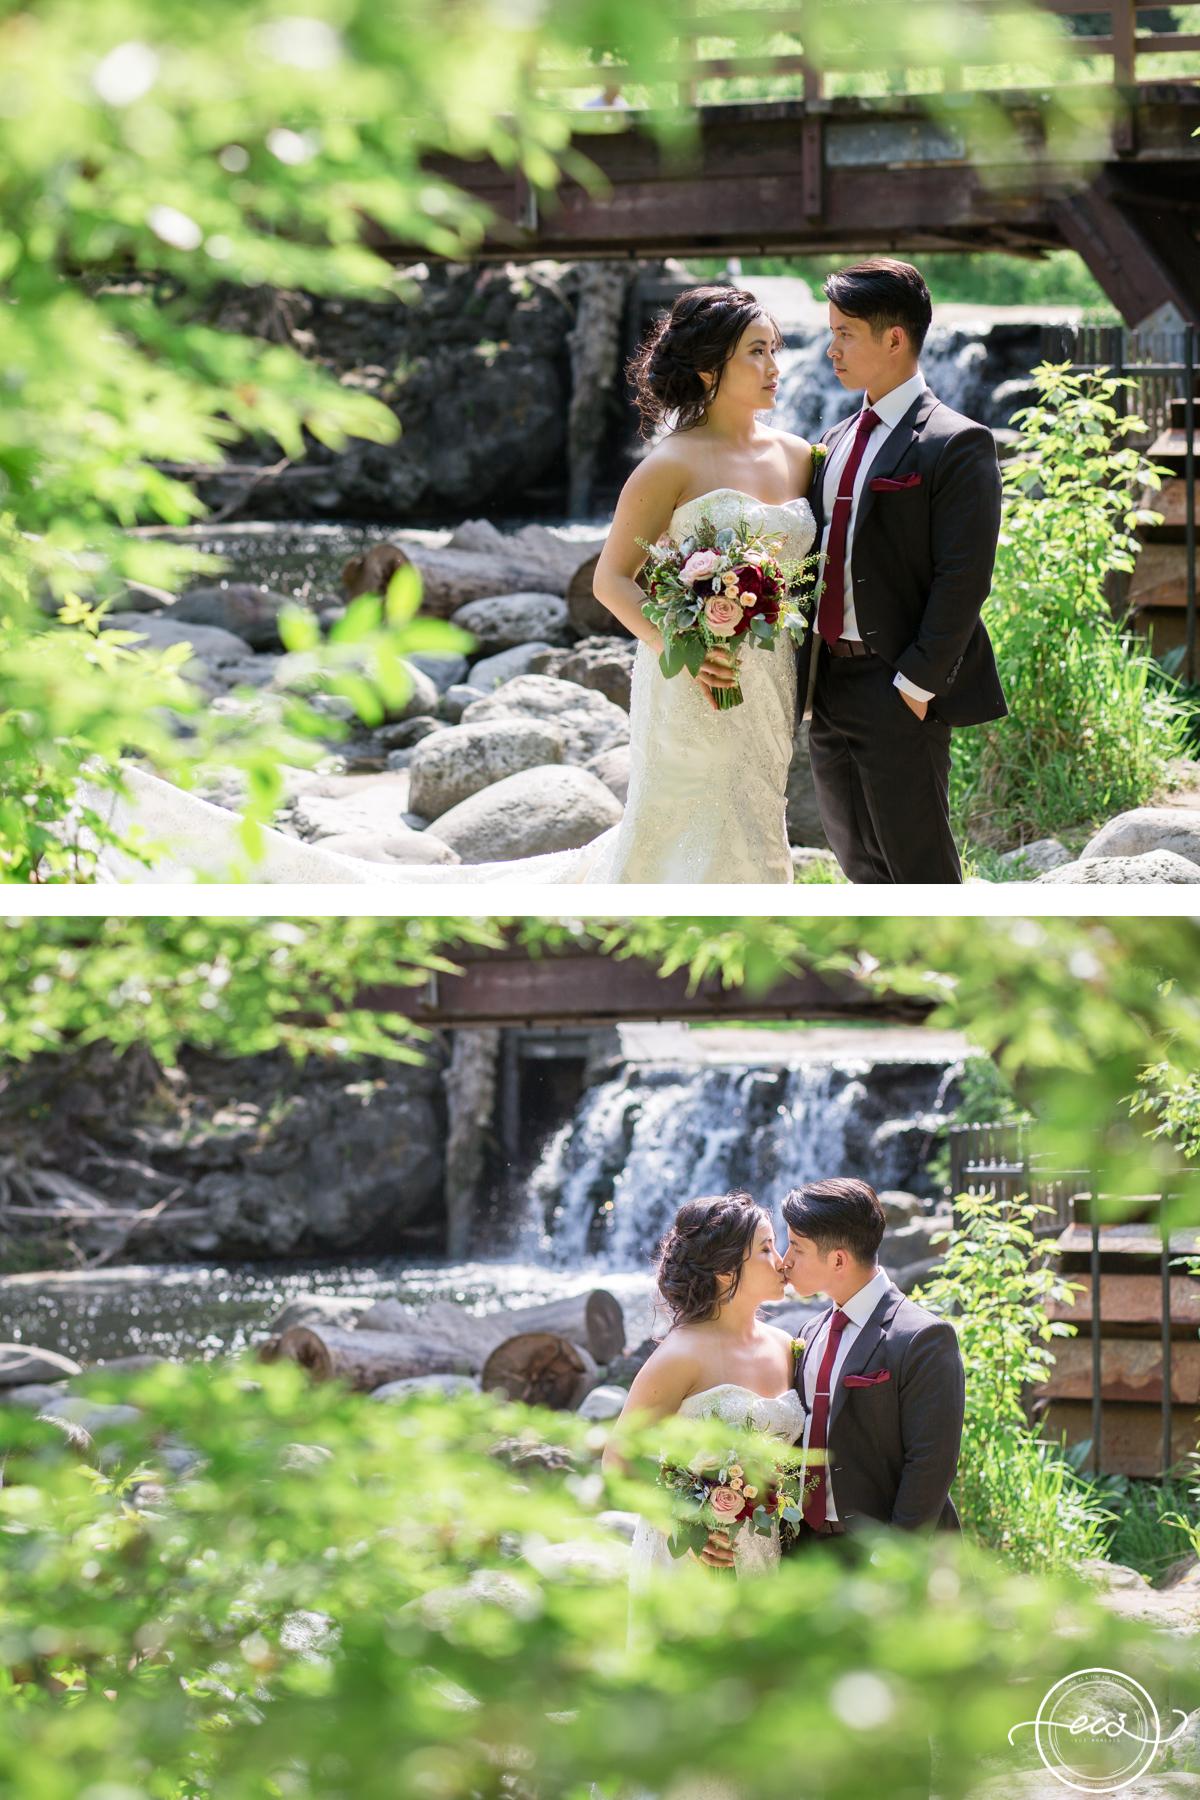 Toronto Edwards Garden and Intimate Vietnamese Wedding20.jpg